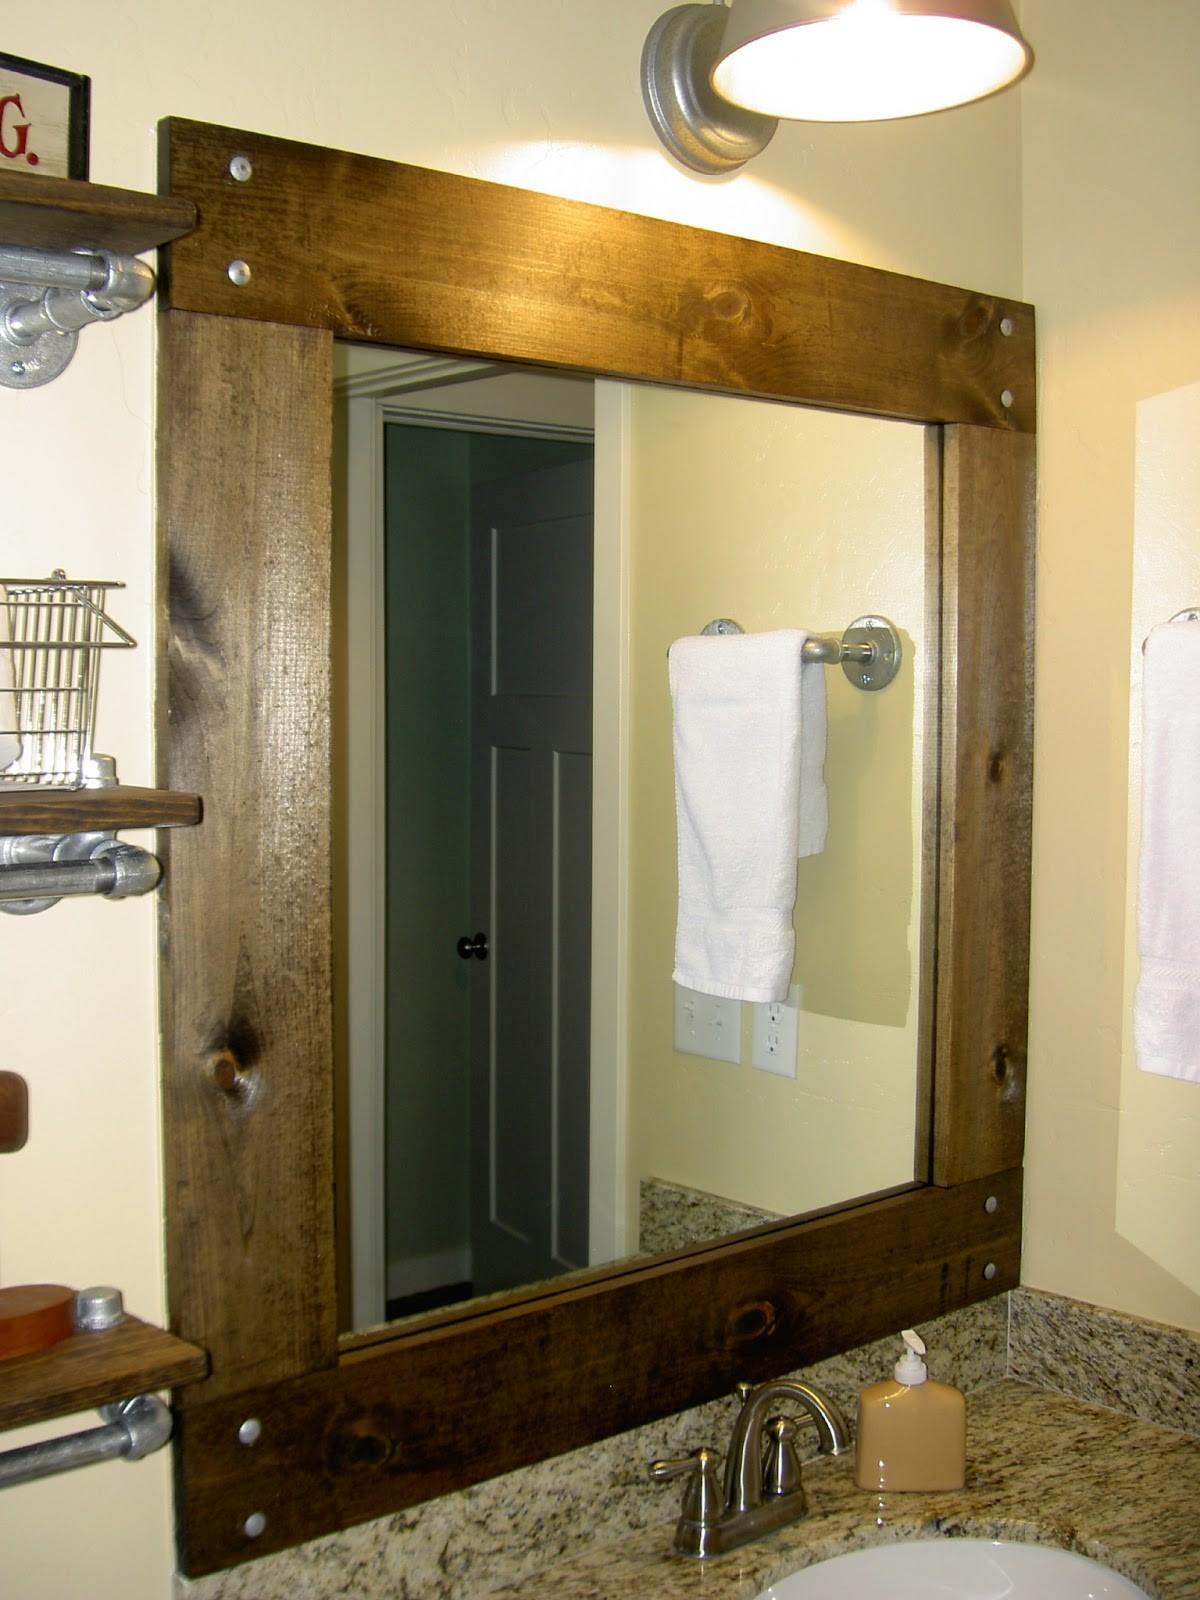 Wood framed bathroom mirrors new impressive bathroom mirrors wood frame in home design concept with ideas